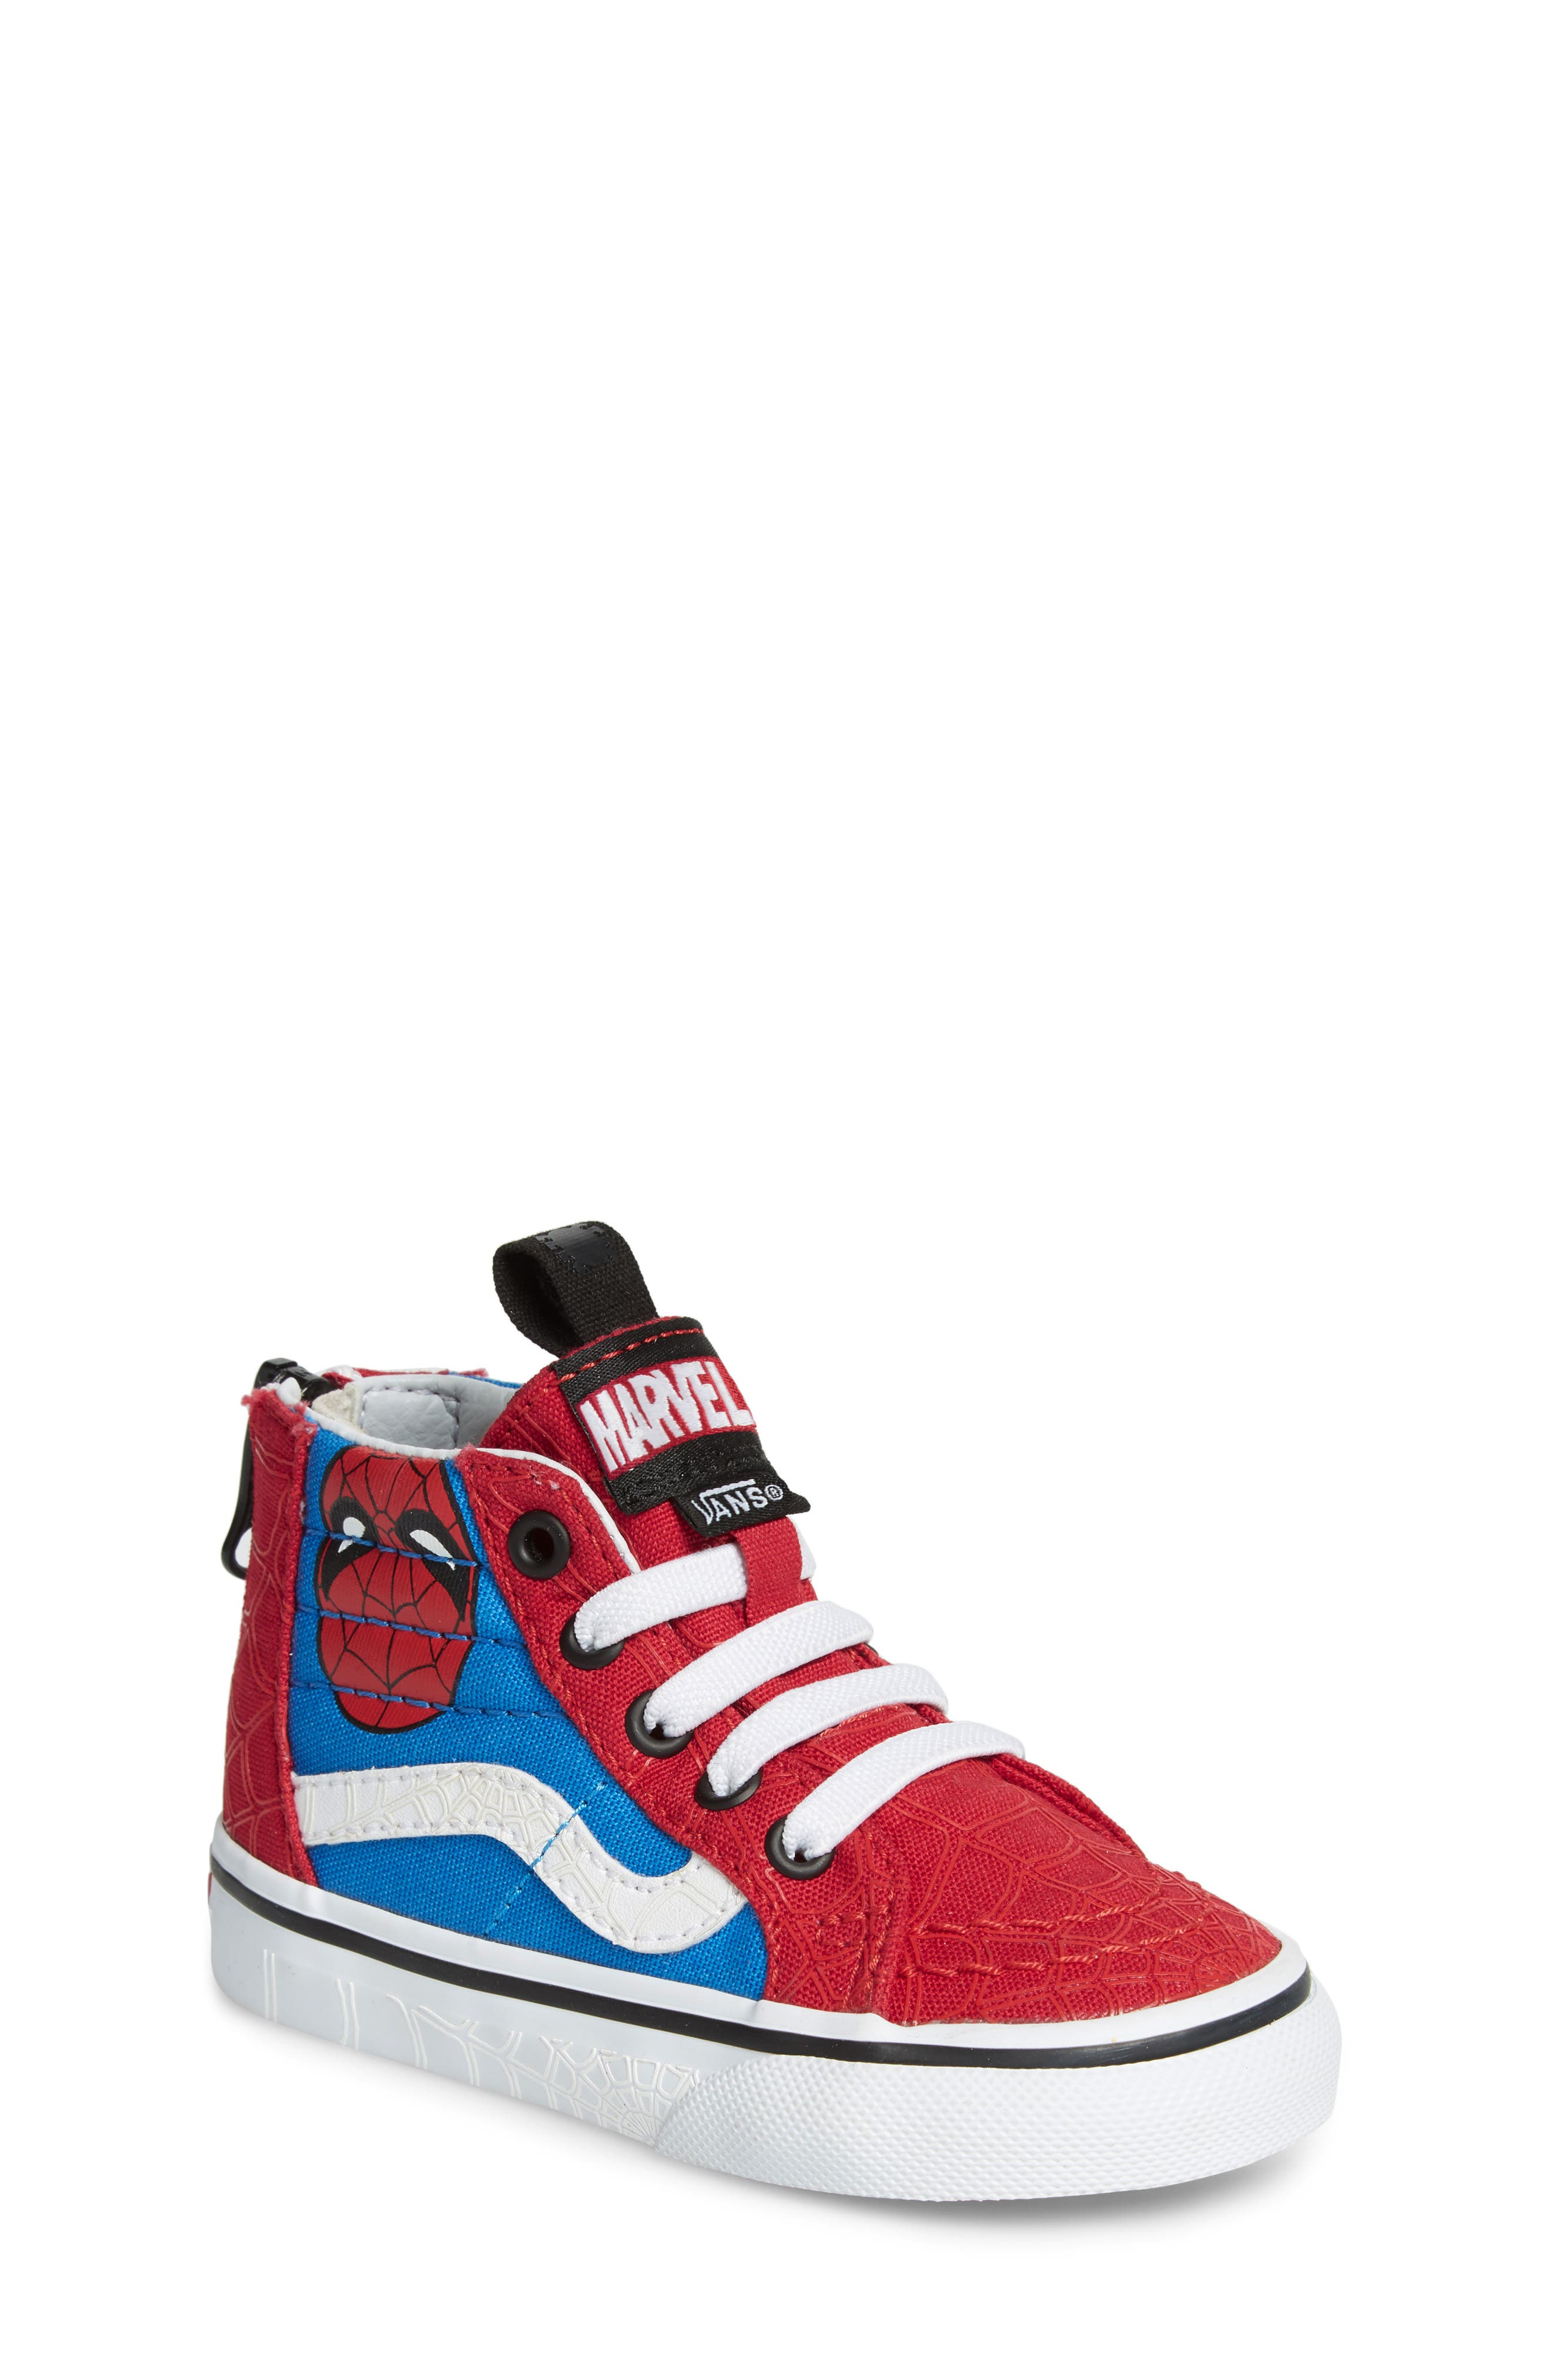 x Marvel<sup>®</sup> Spider-Man SK8-Hi Sneaker,                         Main,                         color,